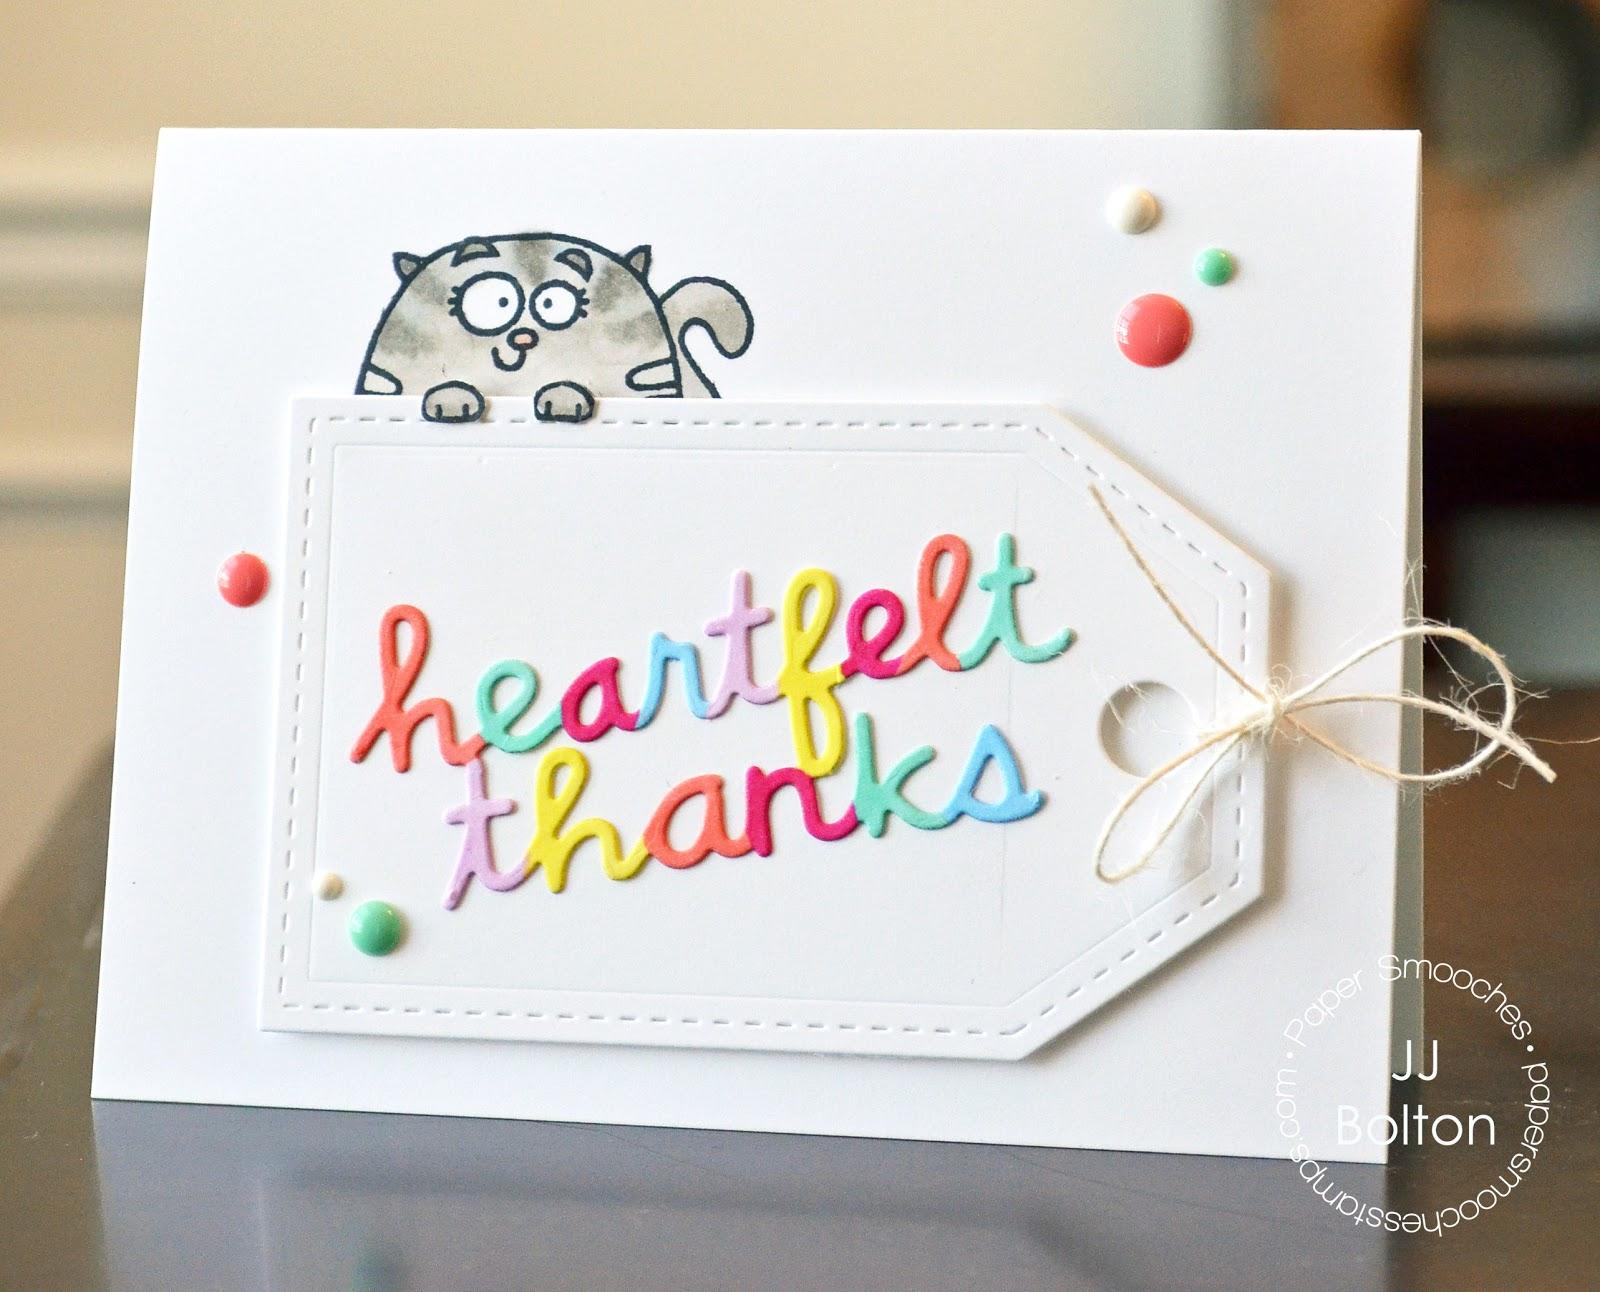 jj bolton {handmade cards}: Heartfelt Thanks with Paper Smooches